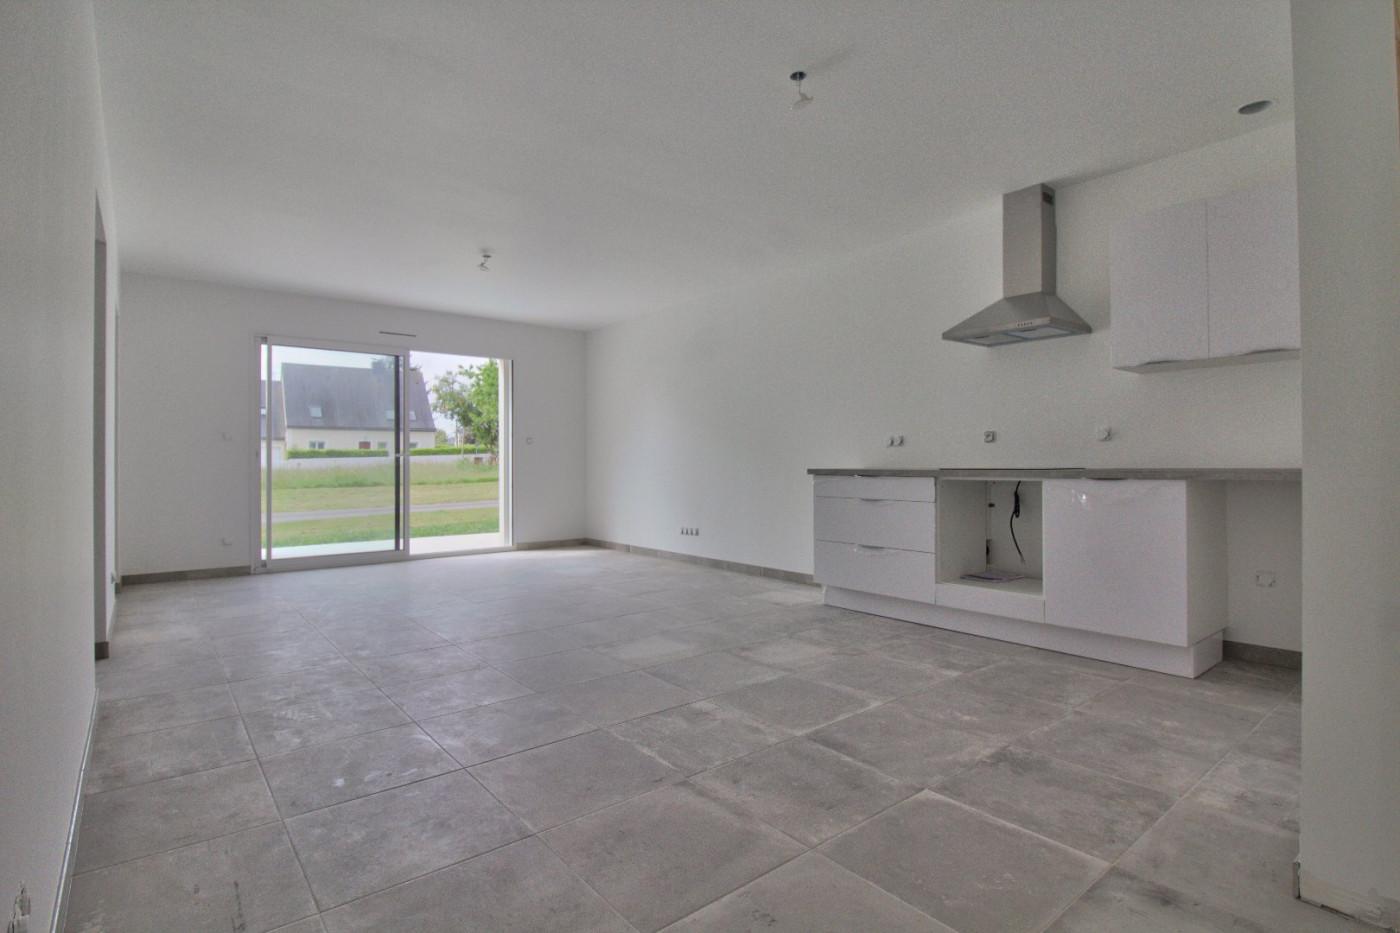 A vendre Chateaubriant 44015594 Agence porte neuve immobilier